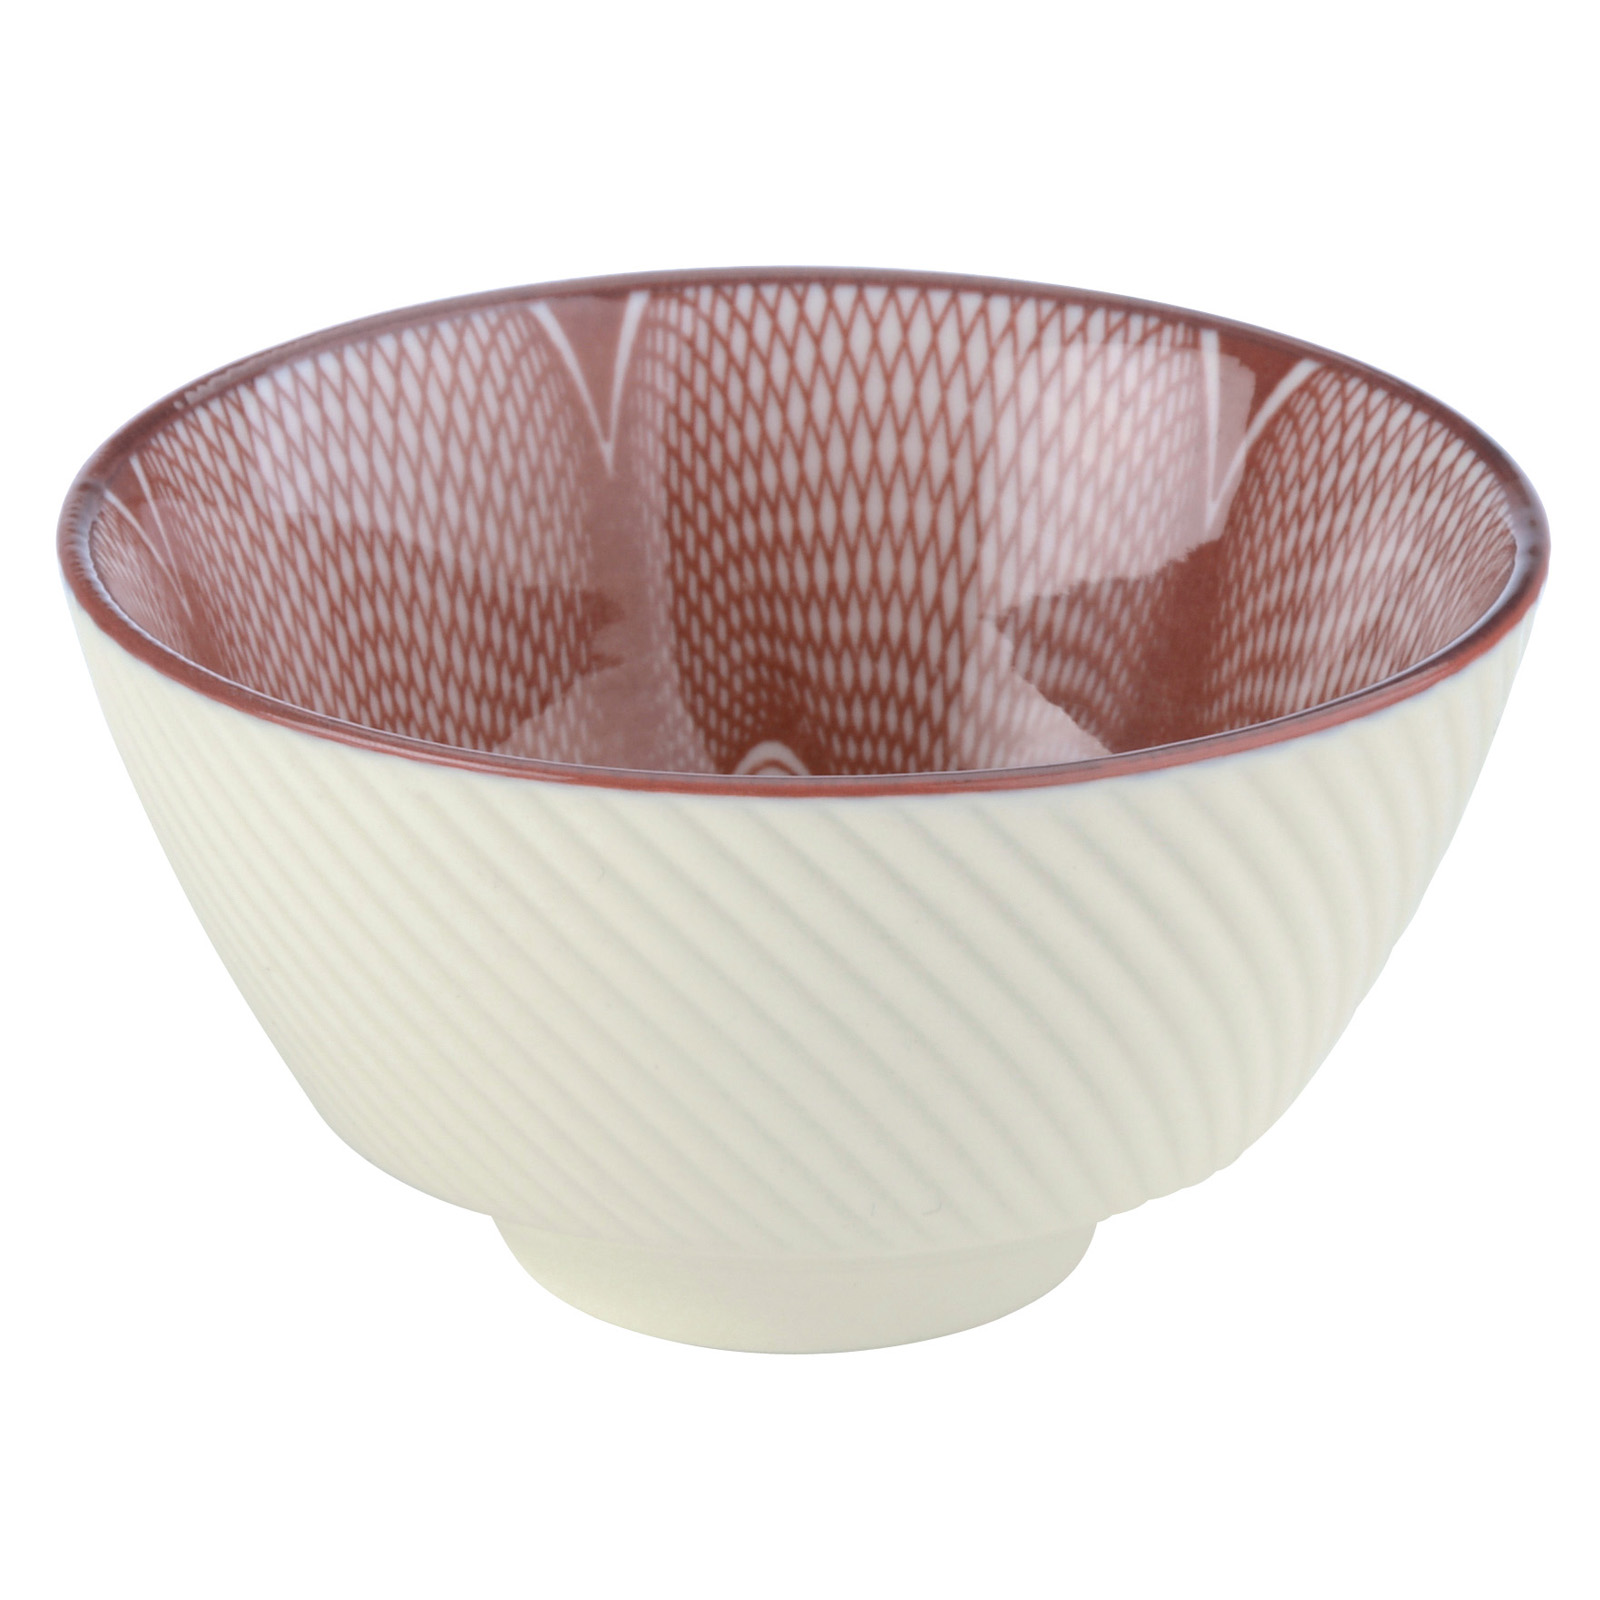 Set of 12 Spyro Tea Bowls Plum by BIA